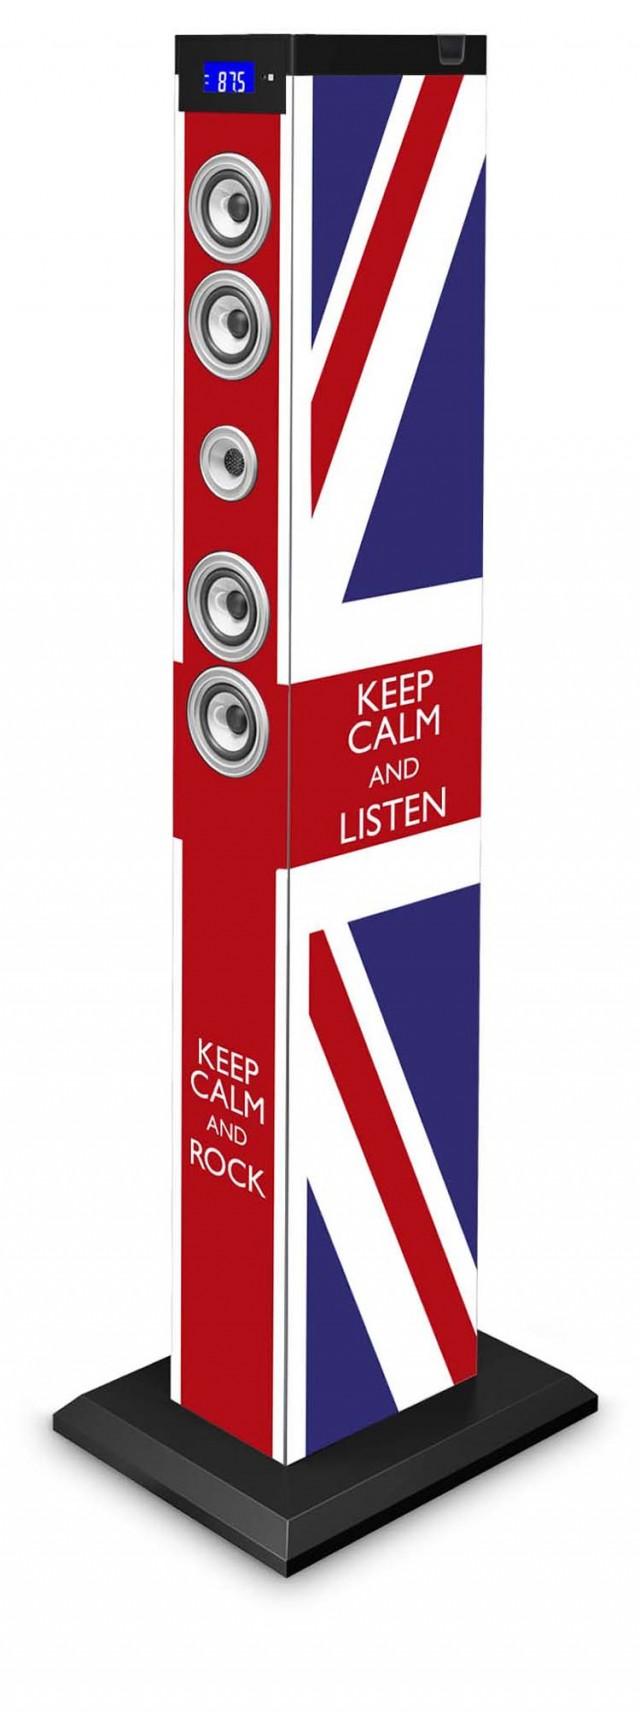 Multimedia Tower Keep Calm (UK) - Packshot